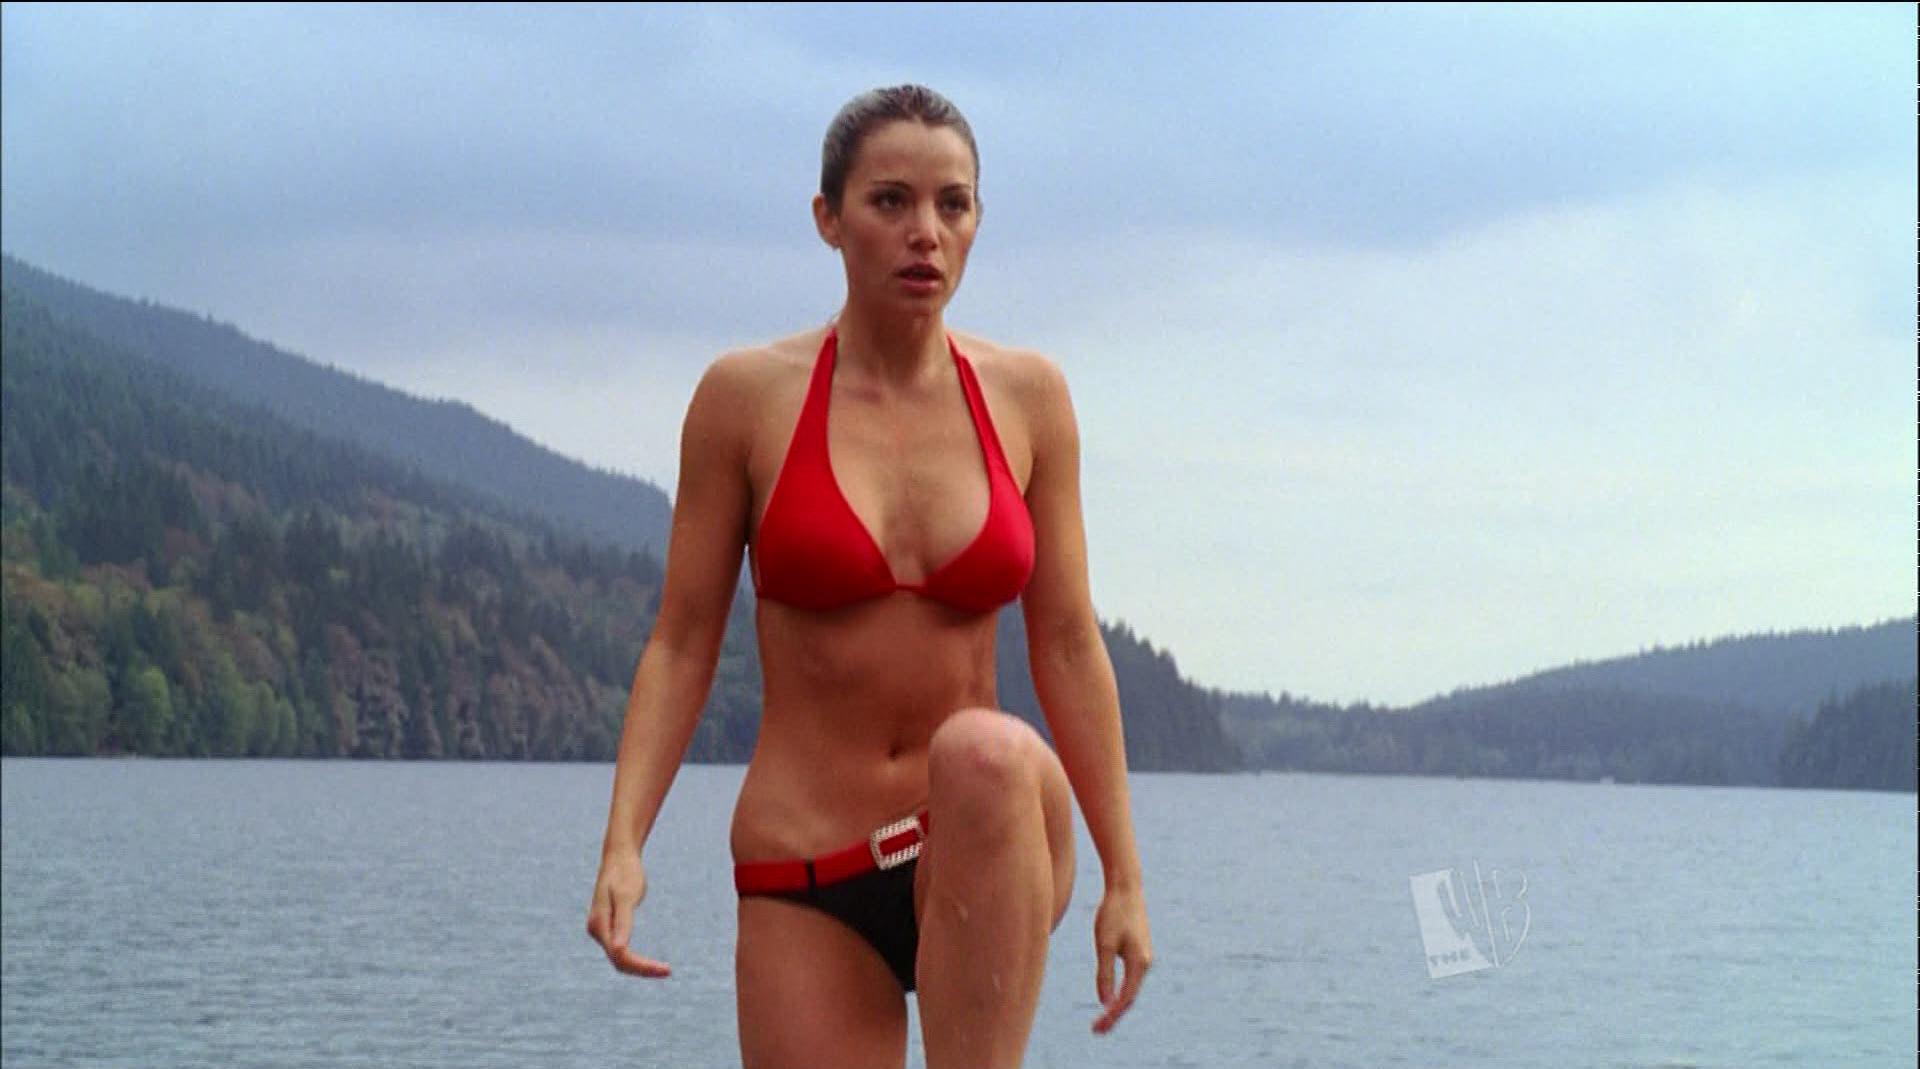 Perhaps shall Erica durance bikini